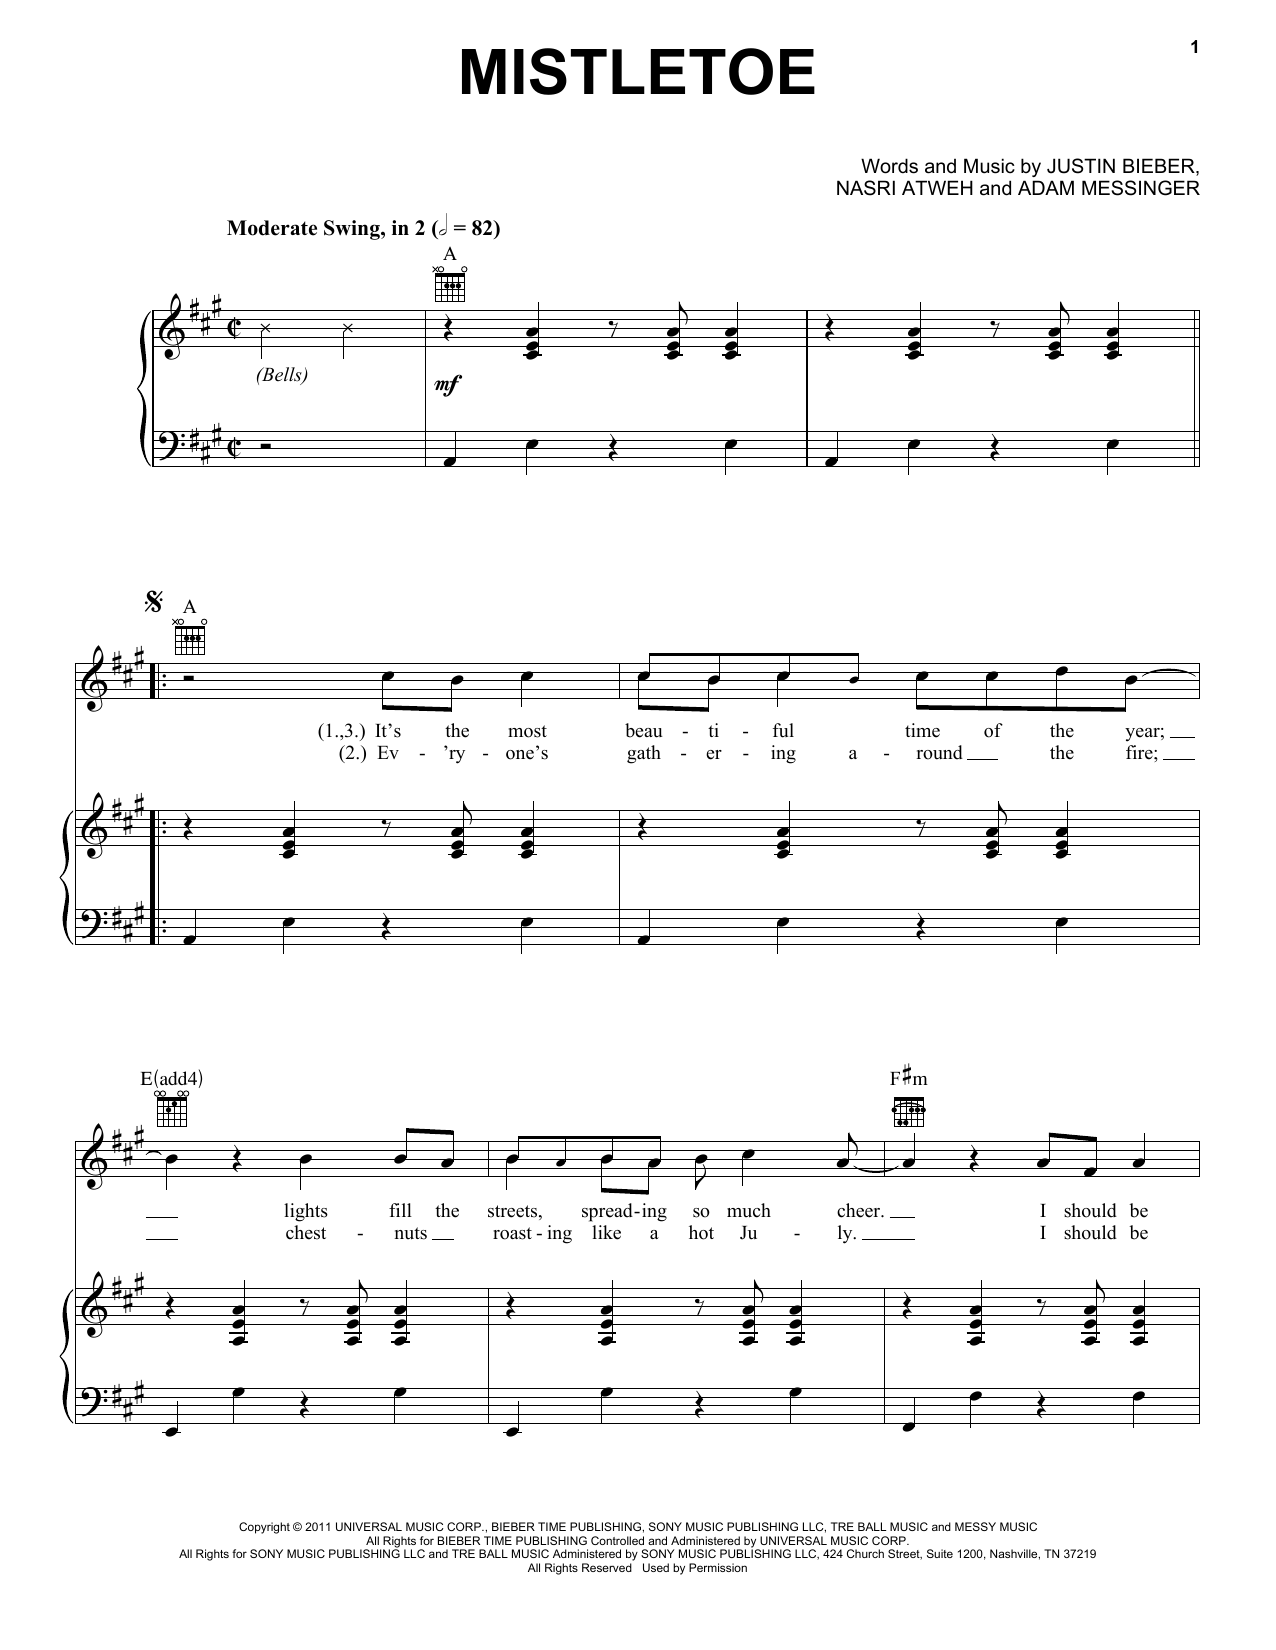 Justin Bieber Mistletoe sheet music notes and chords. Download Printable PDF.